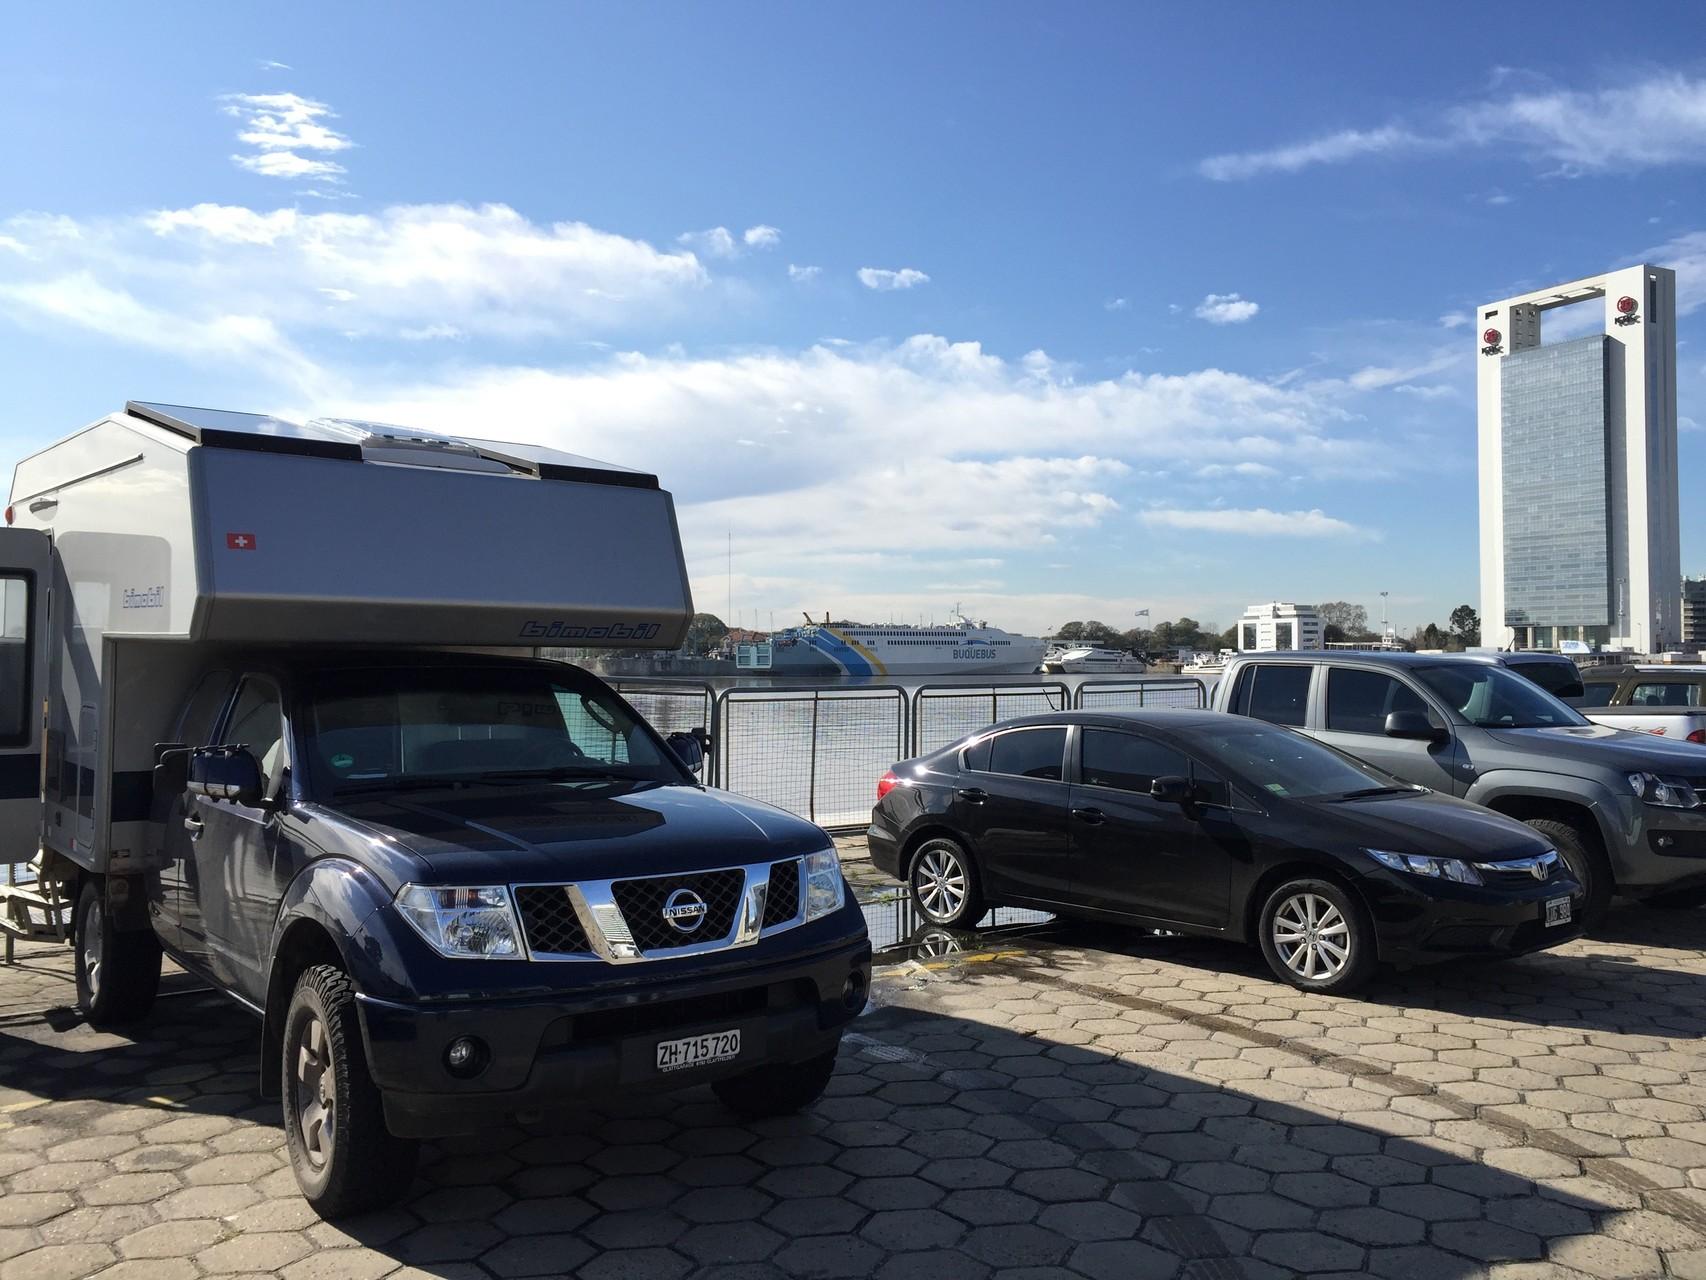 Unser Stellplatz in Buones Aires gegen das Meer......